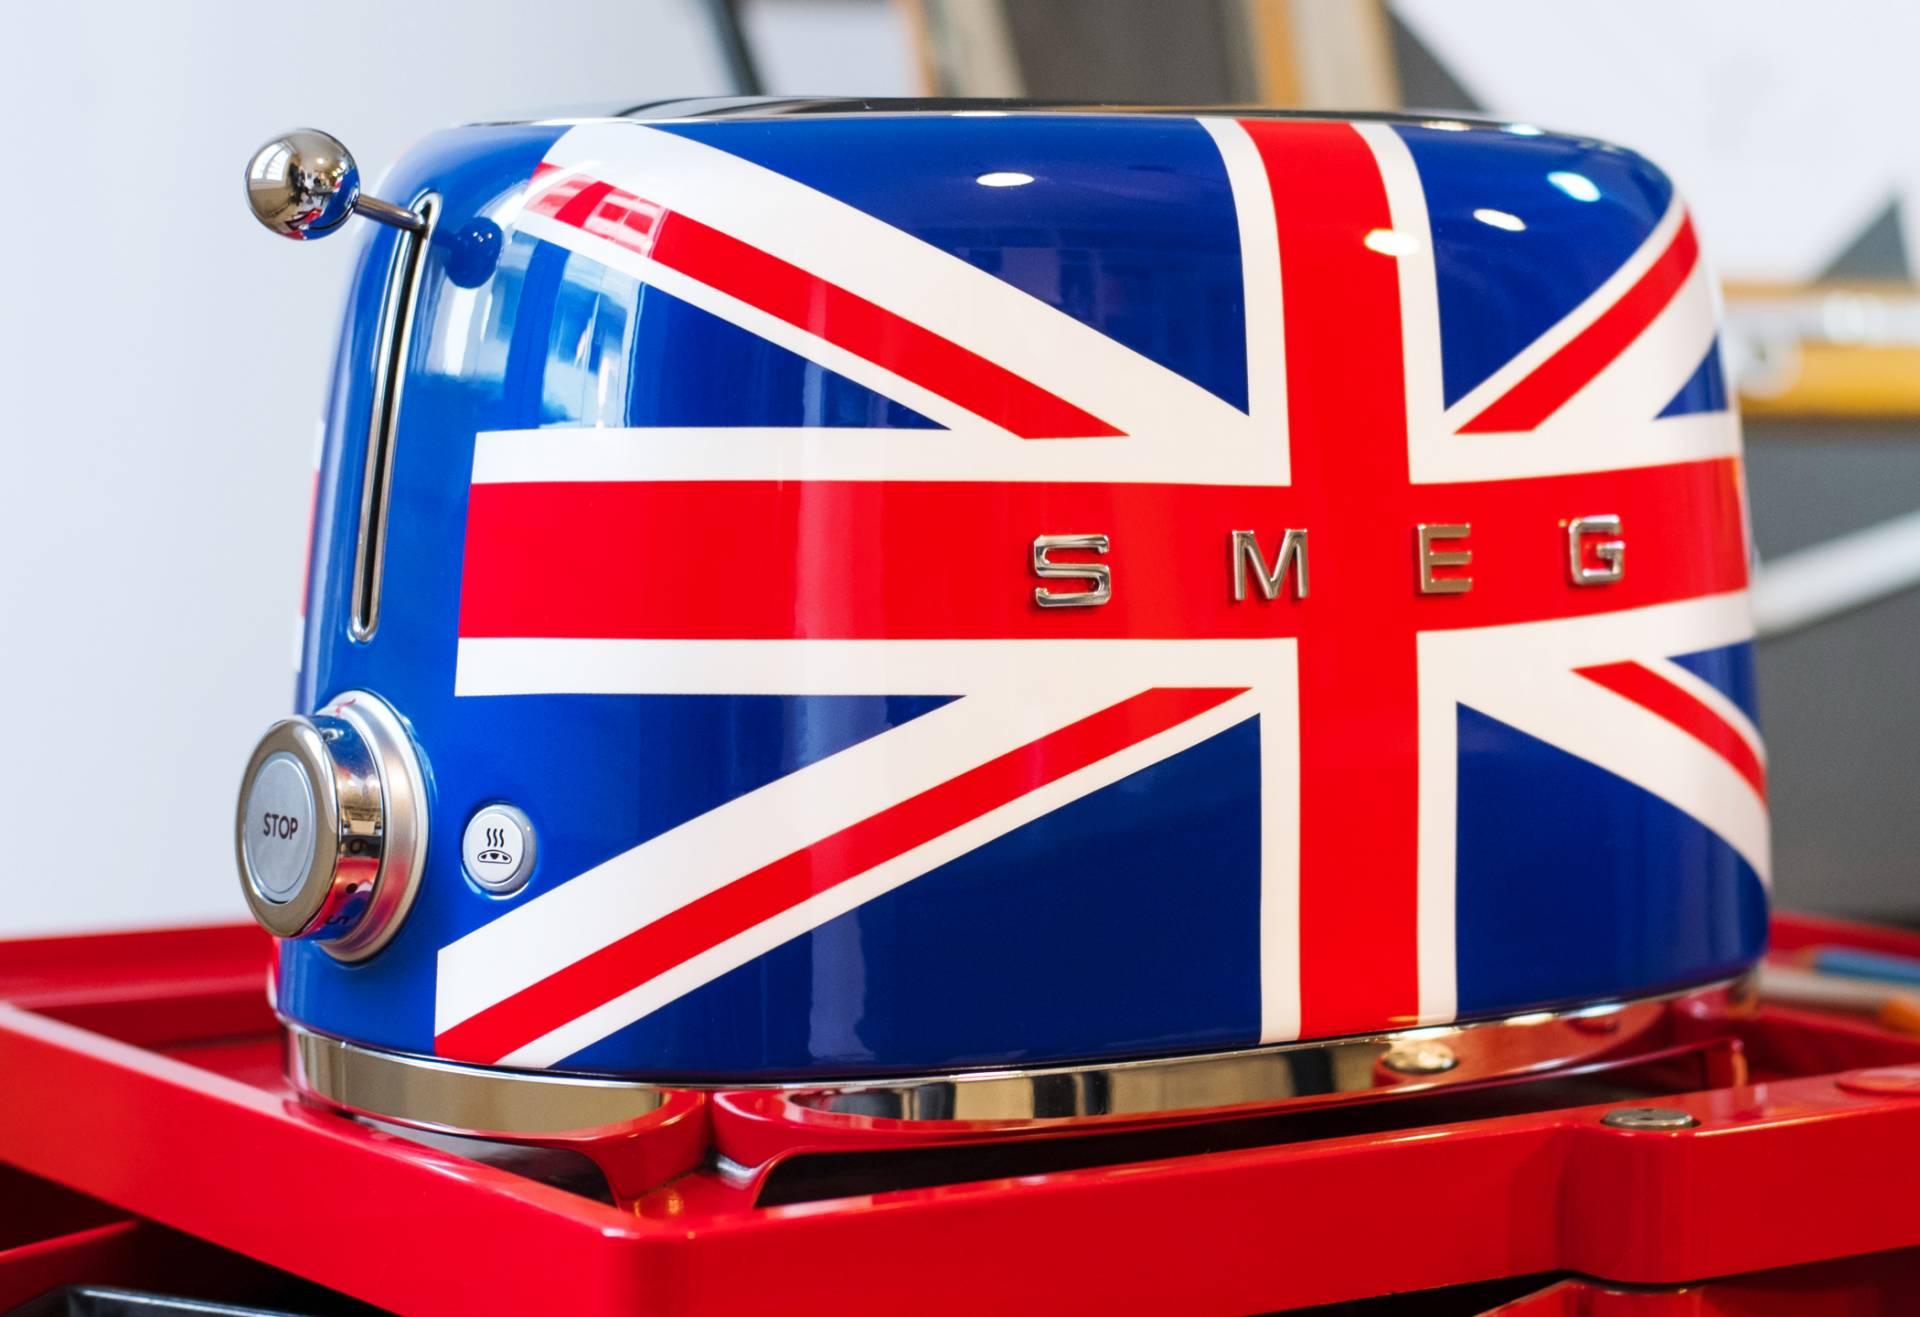 Smeg Kühlschrank Union Jack : Smeg dunstabzugshaube retro: store smeg rhein main smeg de. retro